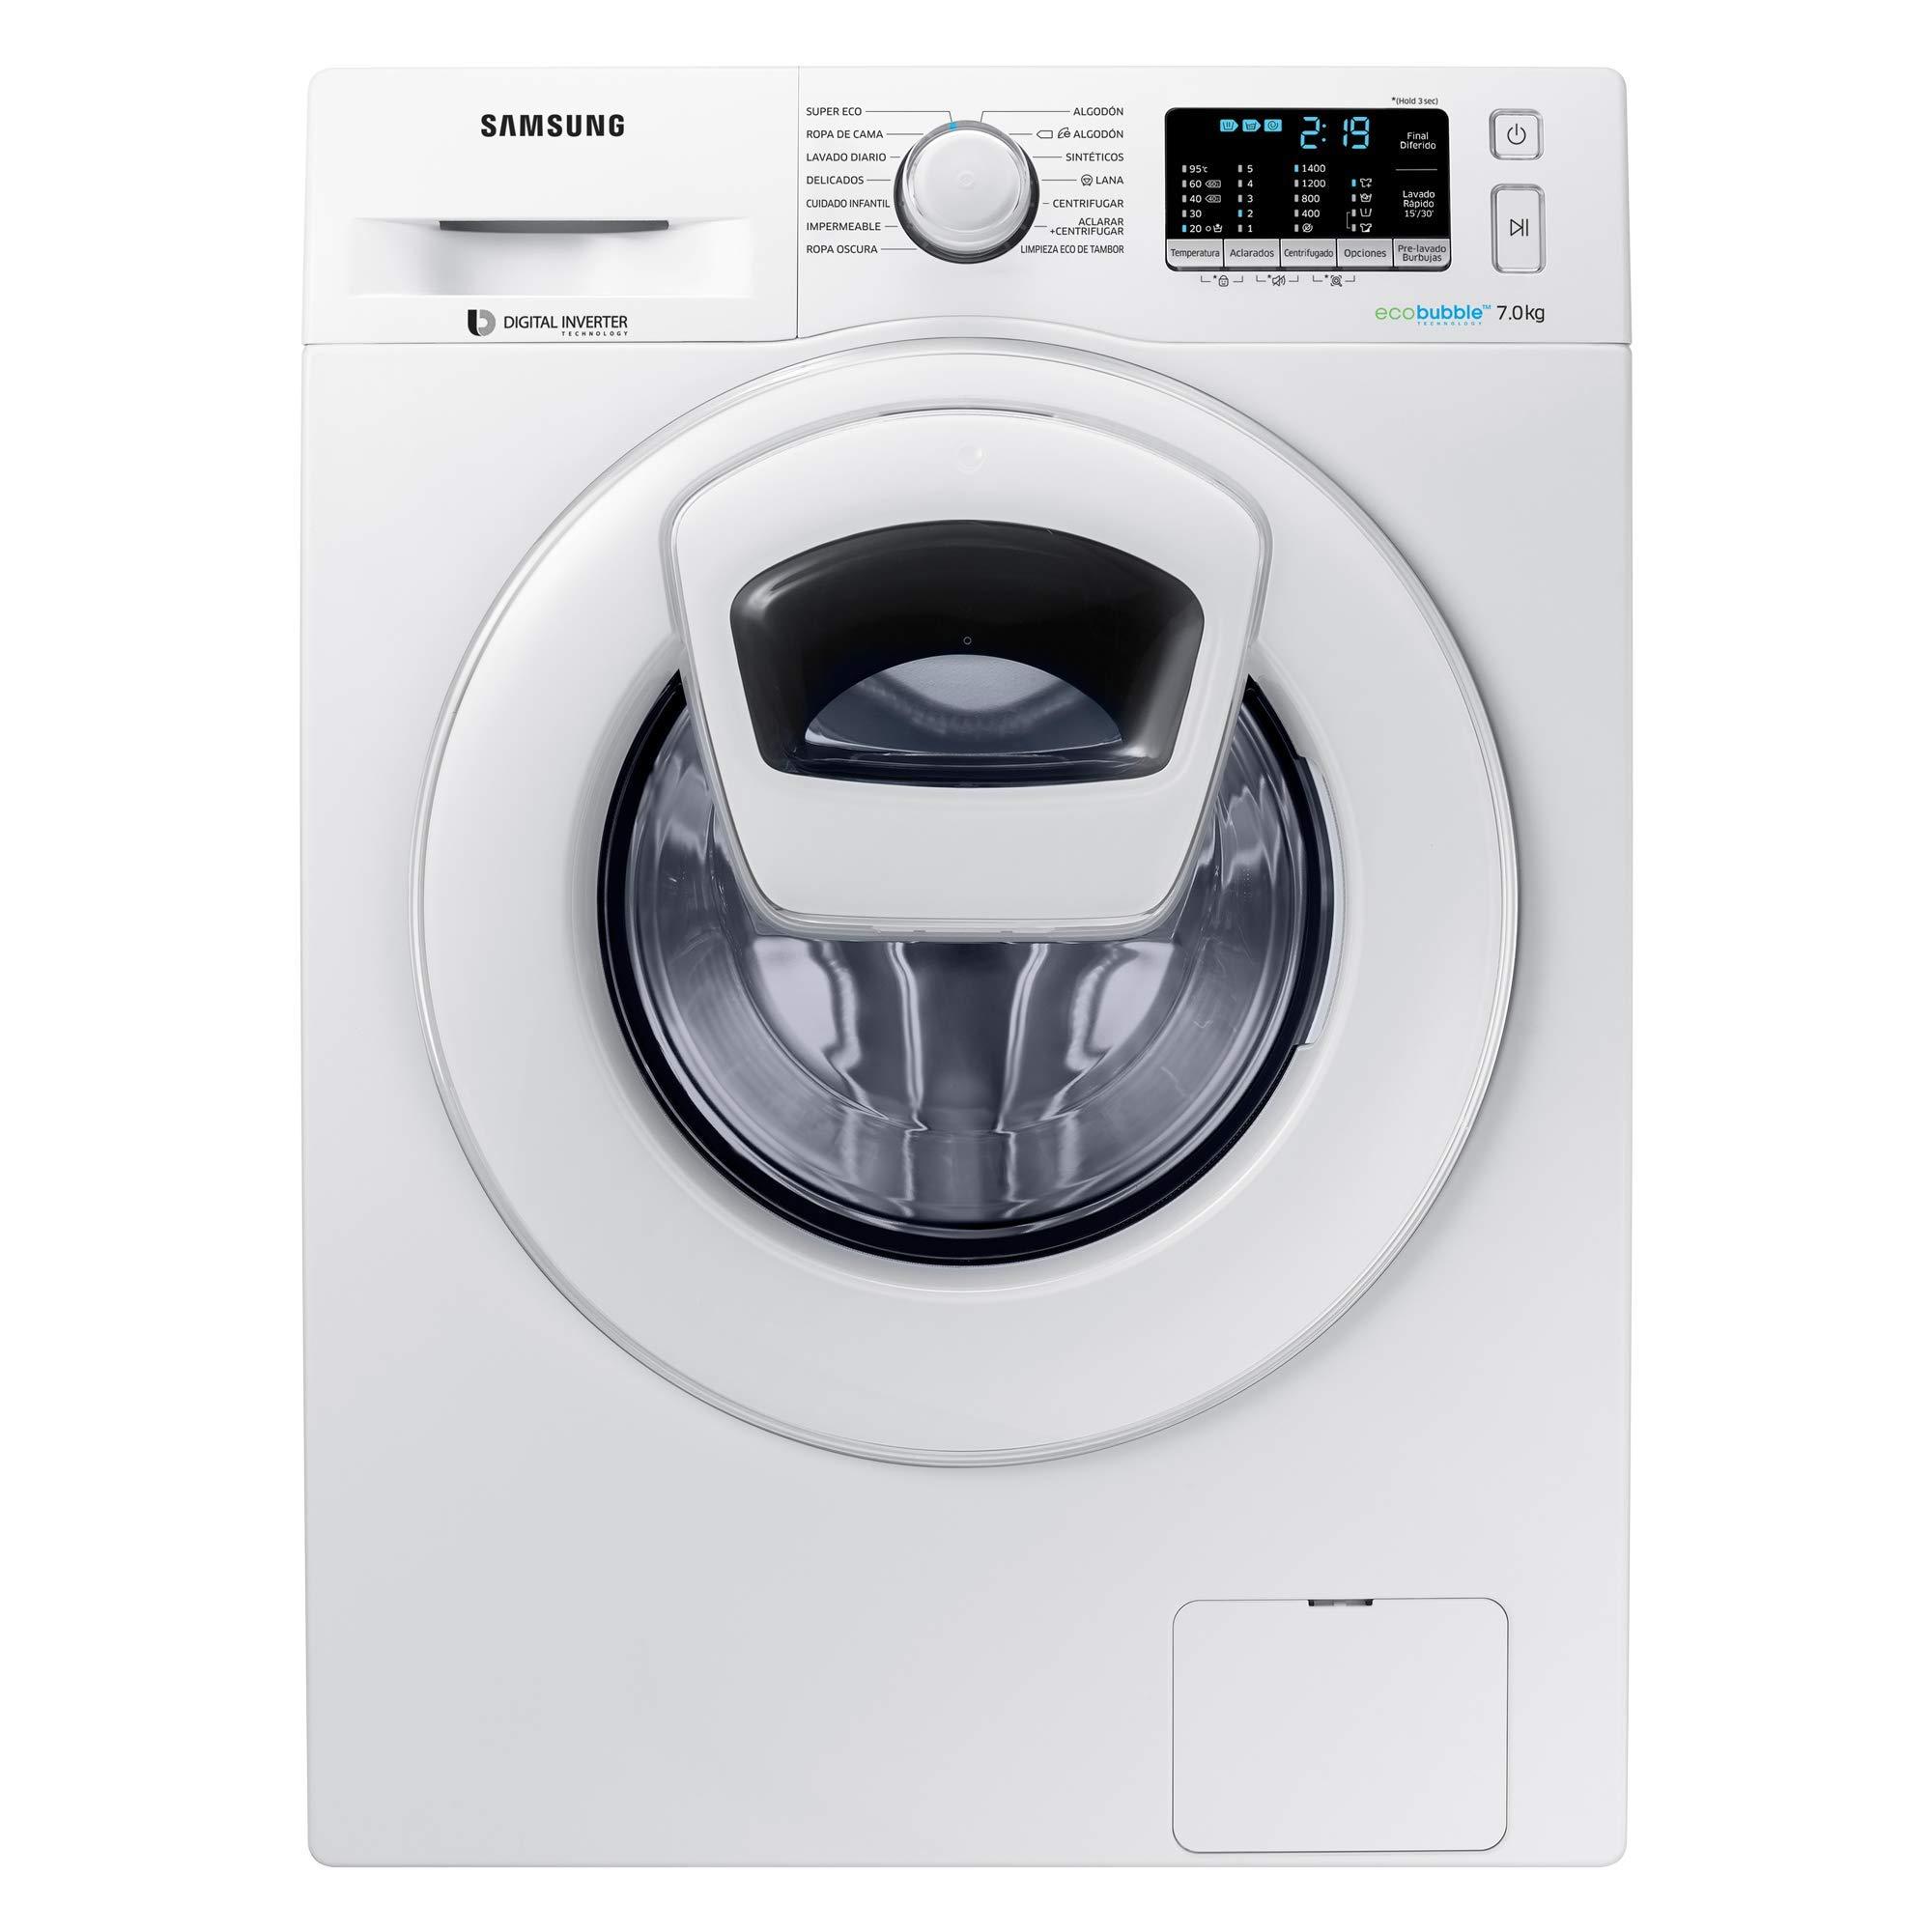 Samsung-WW70K5410WW-Waschmaschine-freistehend-Frontlader-7-kg-1400-Umin-A-Wei